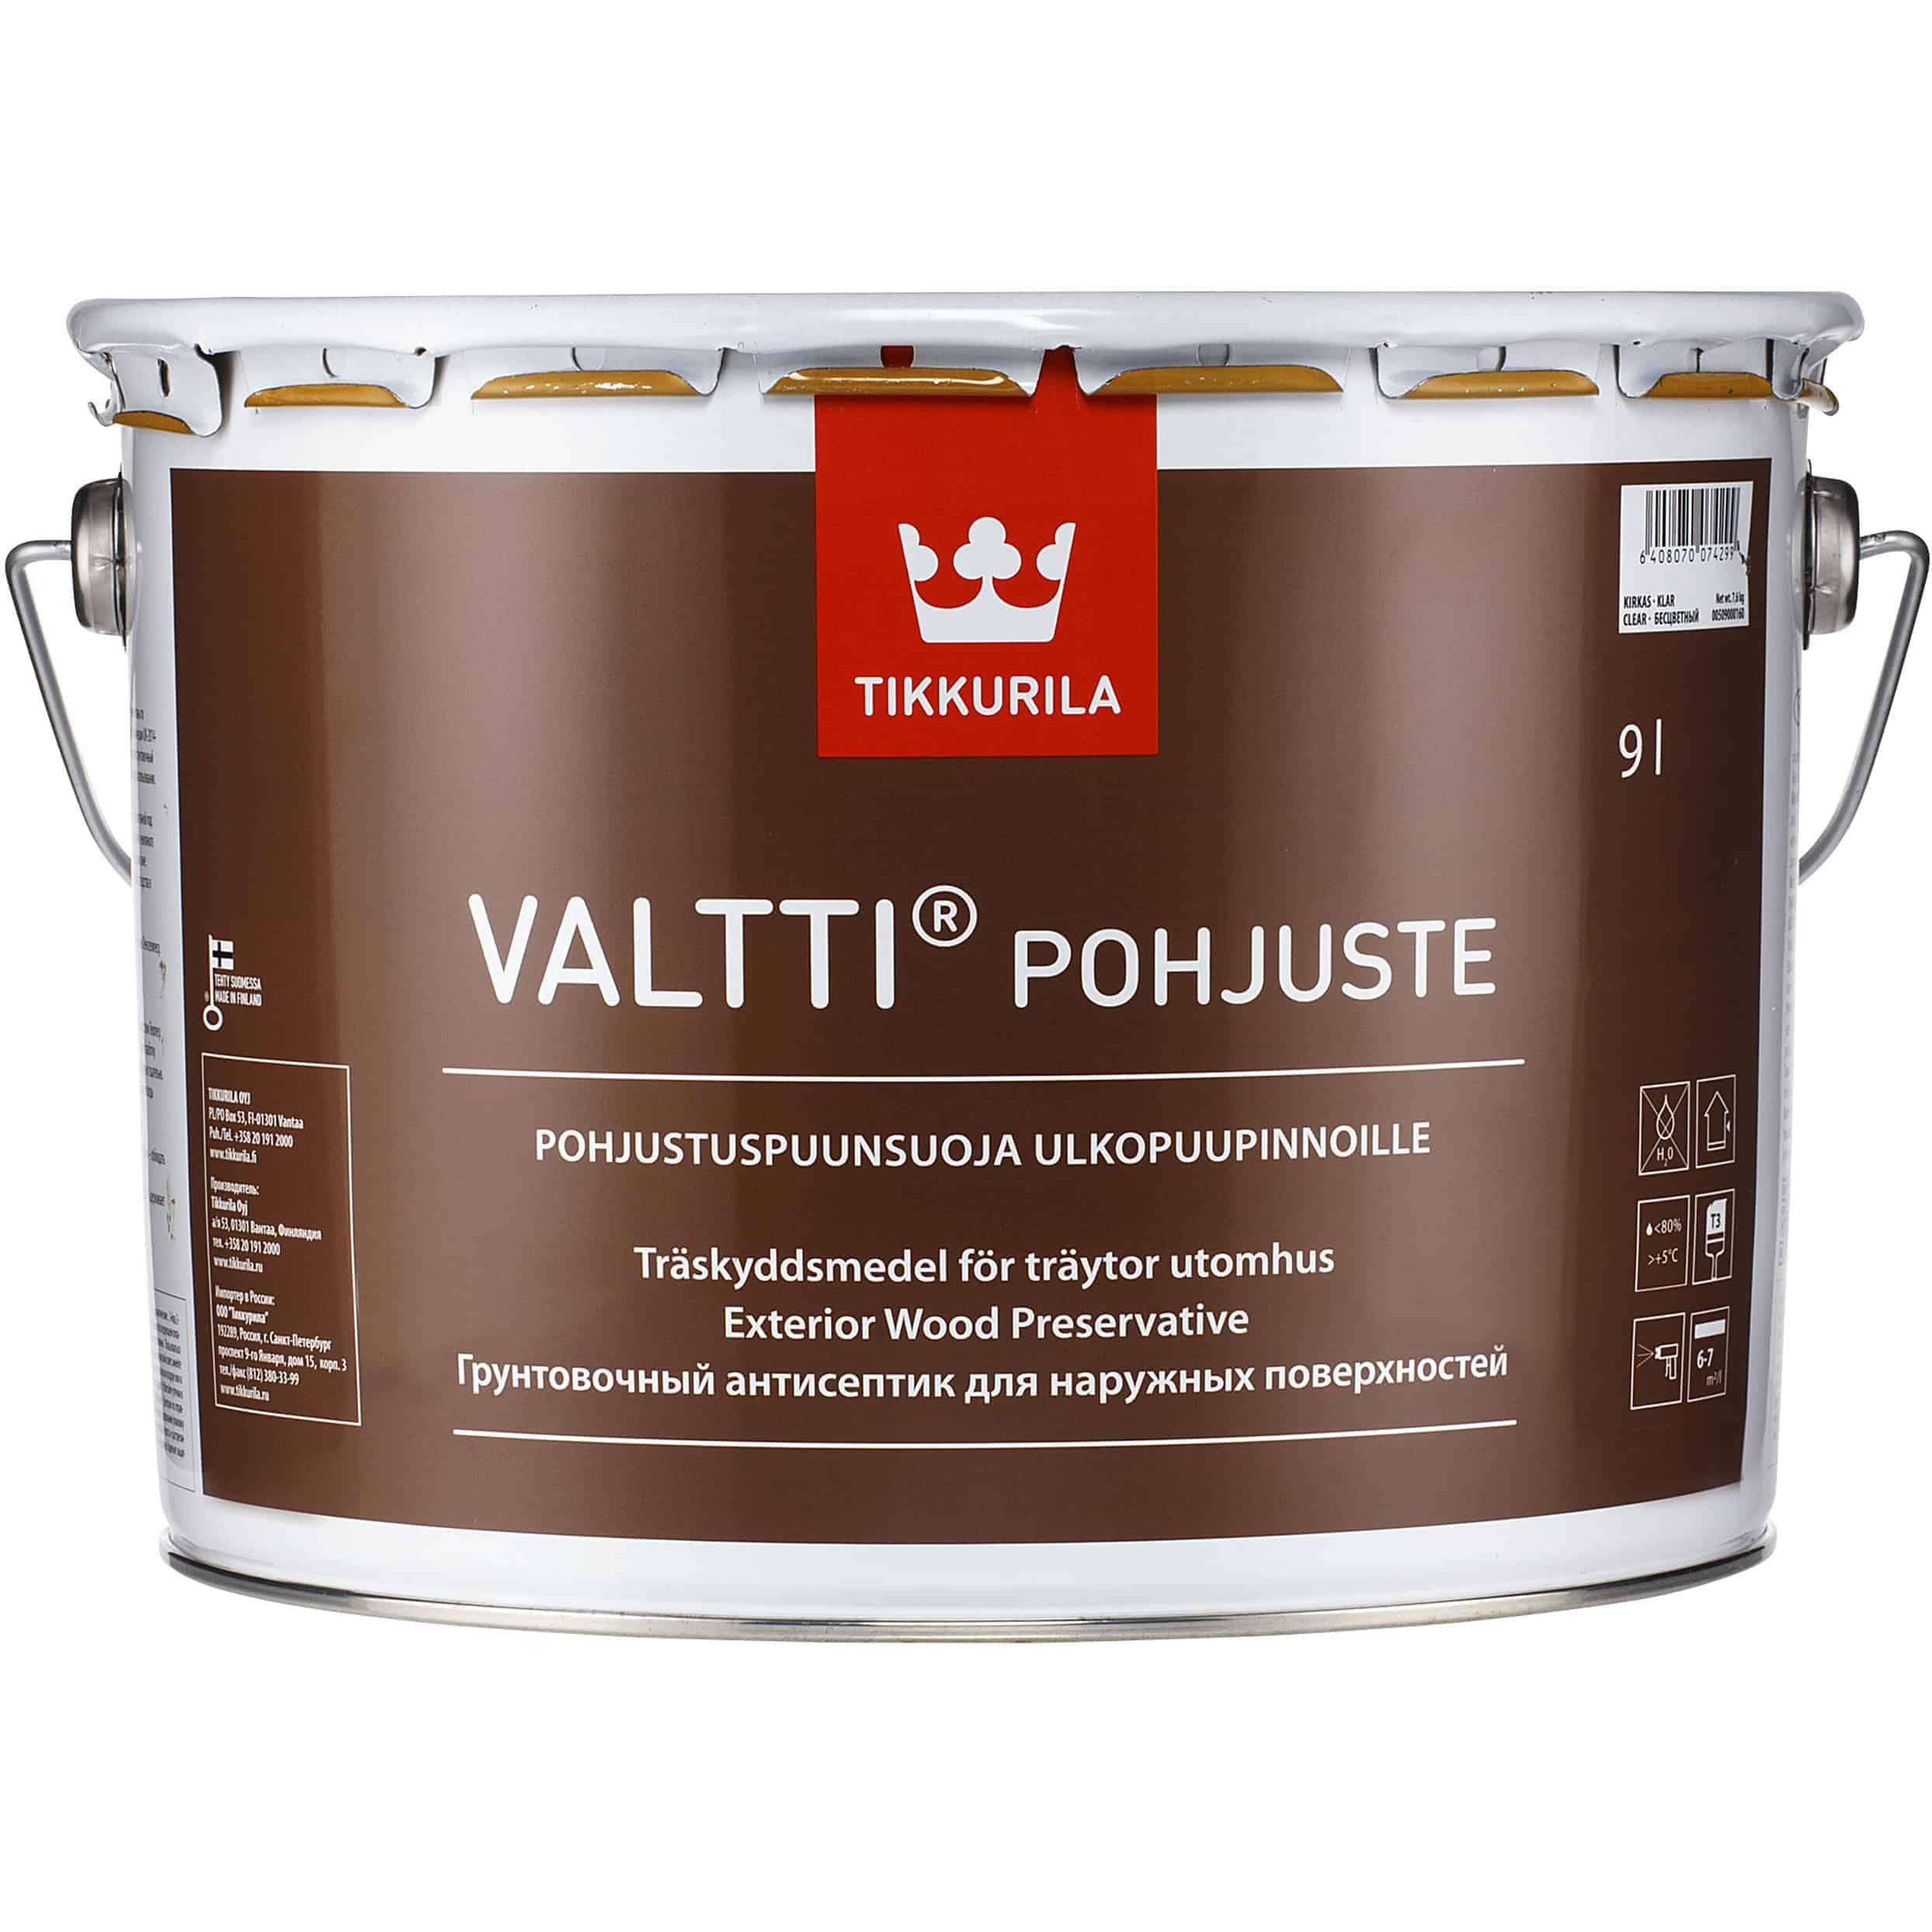 VALTTI POHJUSTE VÄRITÖN 9L